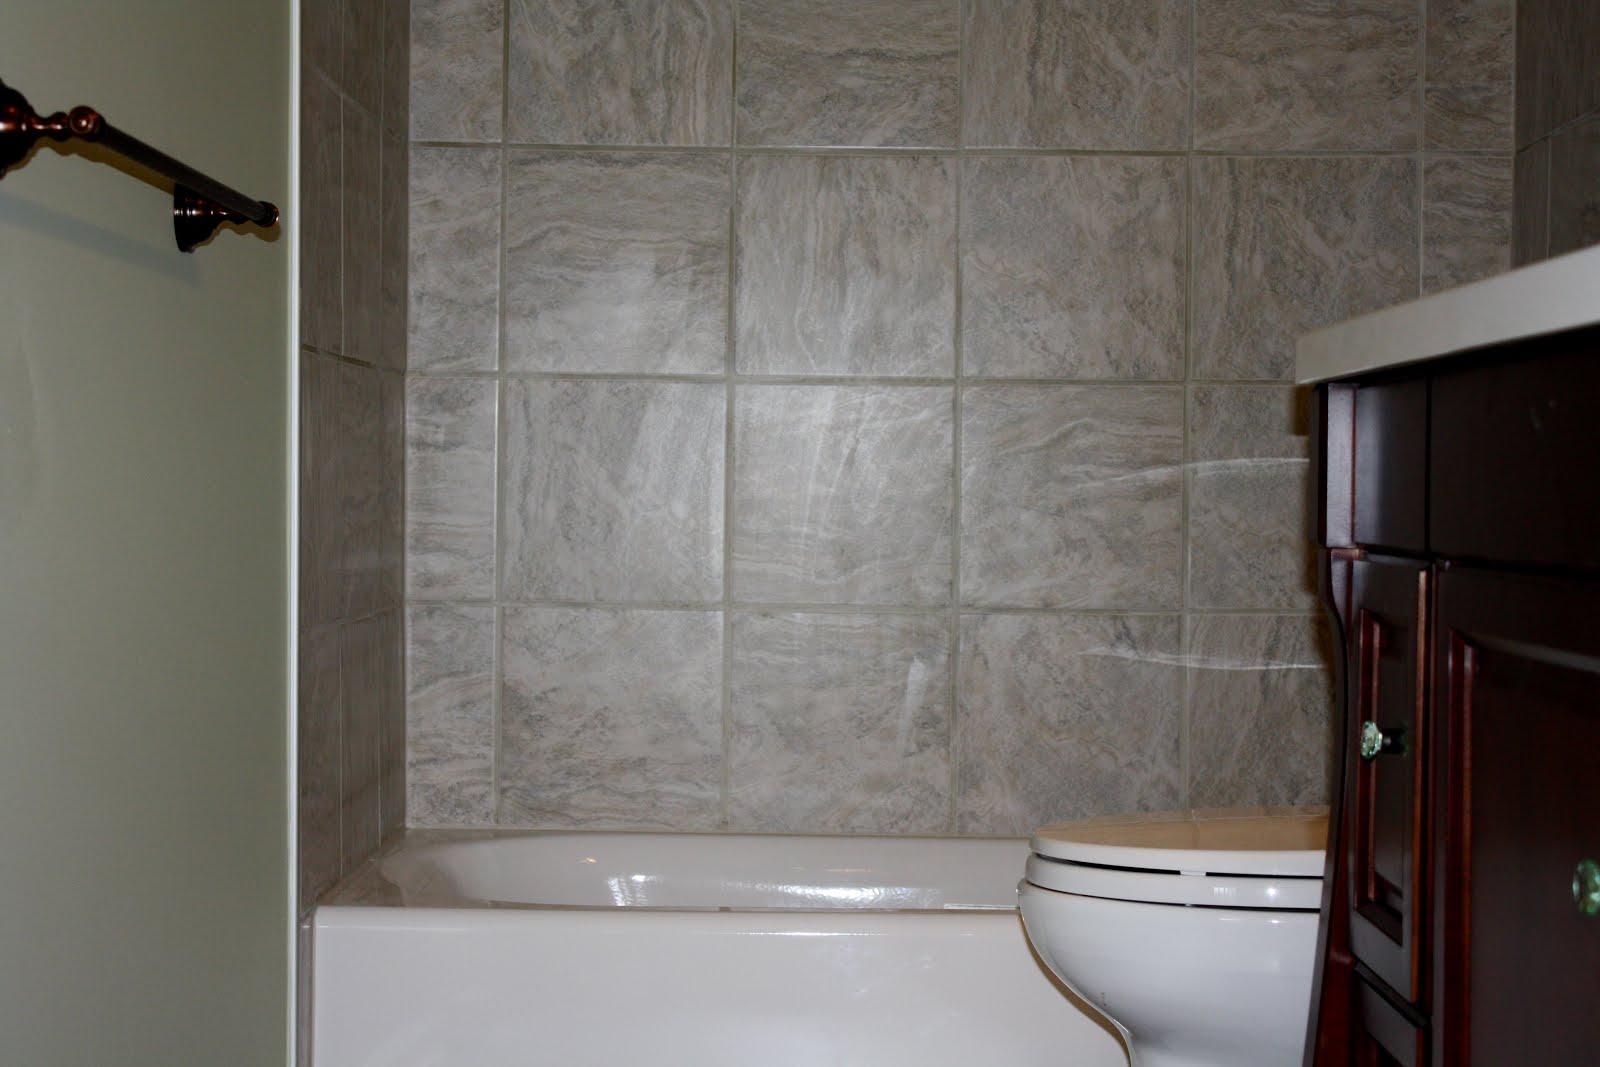 Bathroom Linoleum Photos And Products Ideas regarding dimensions 1600 X 1067